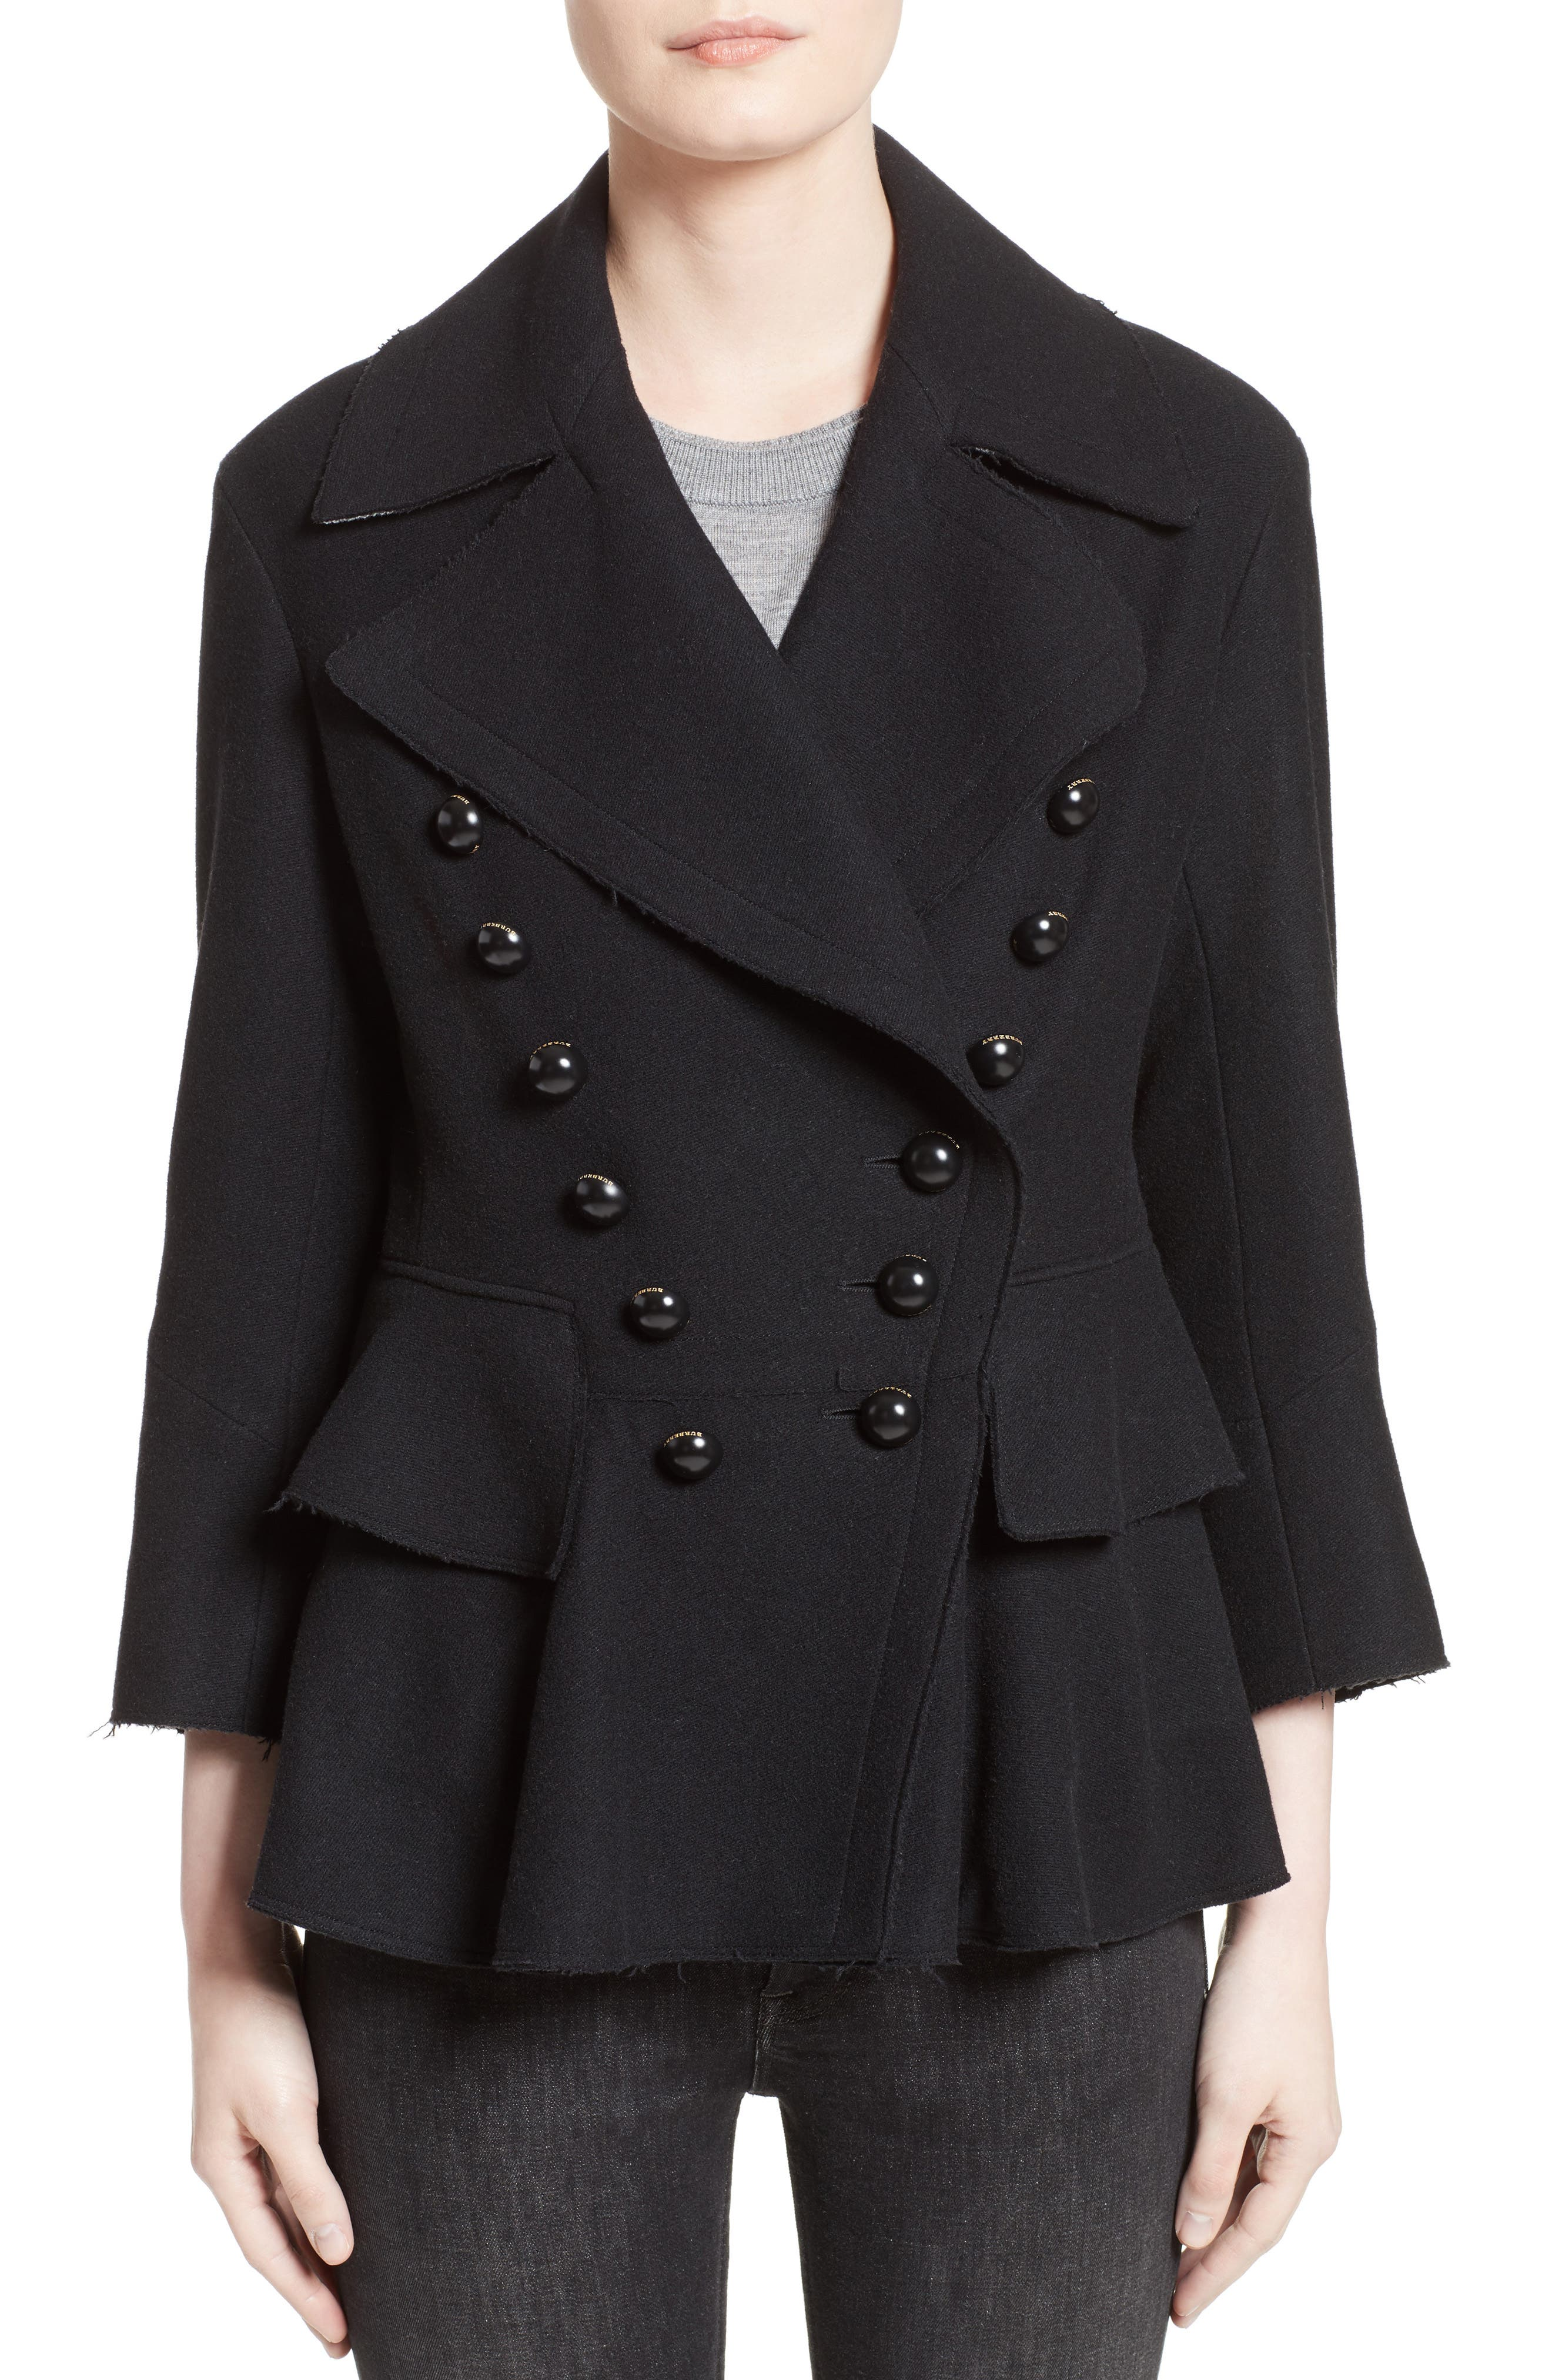 Alvingham Wool Blend Jacket,                             Main thumbnail 1, color,                             001